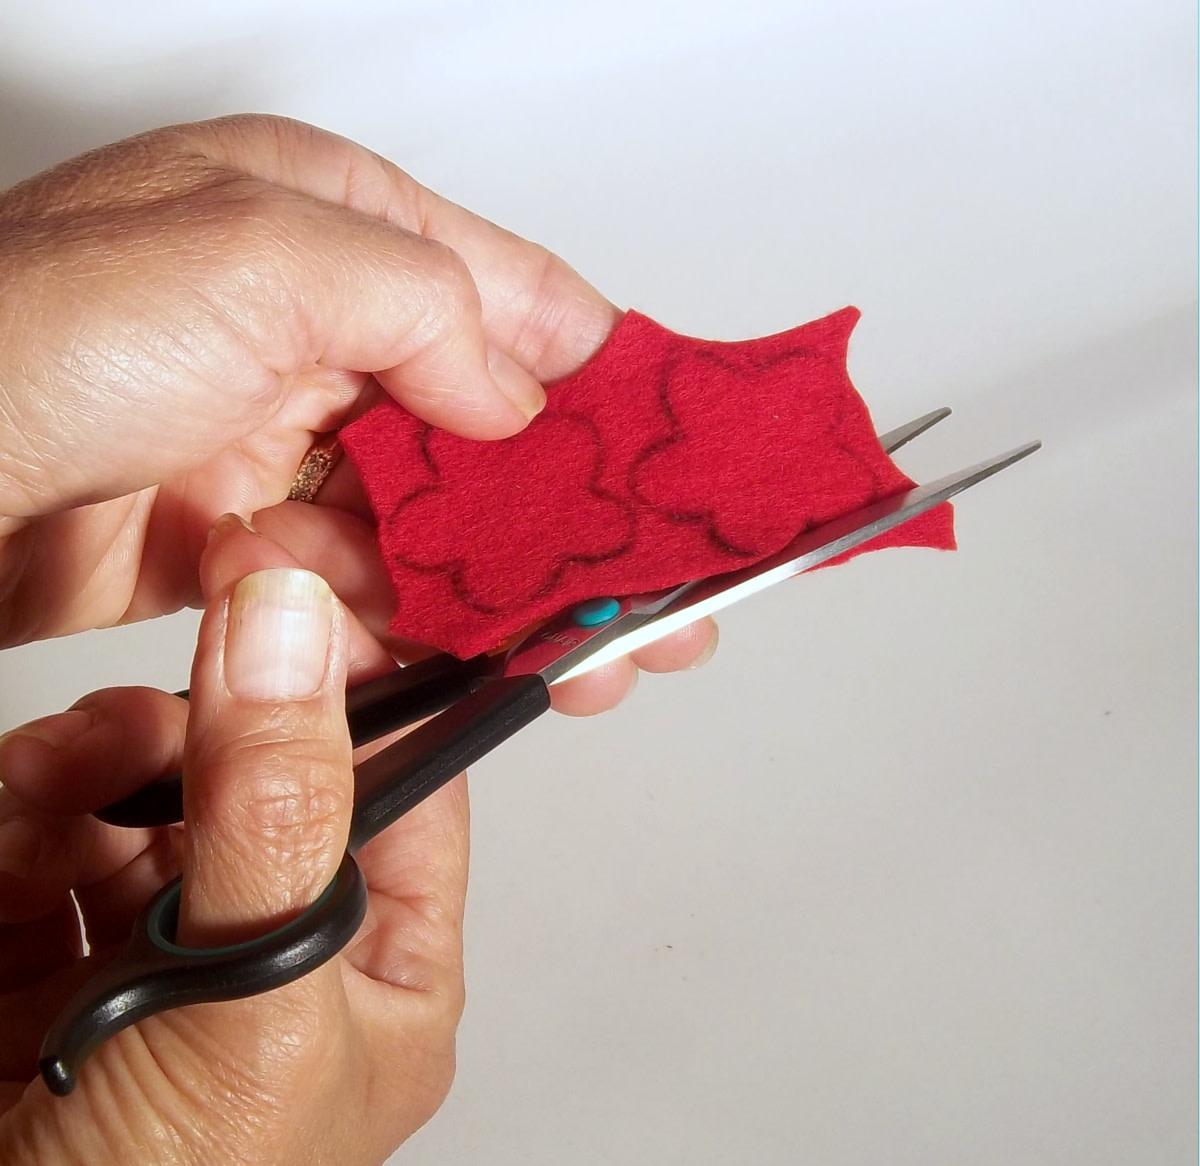 Cutting the petals